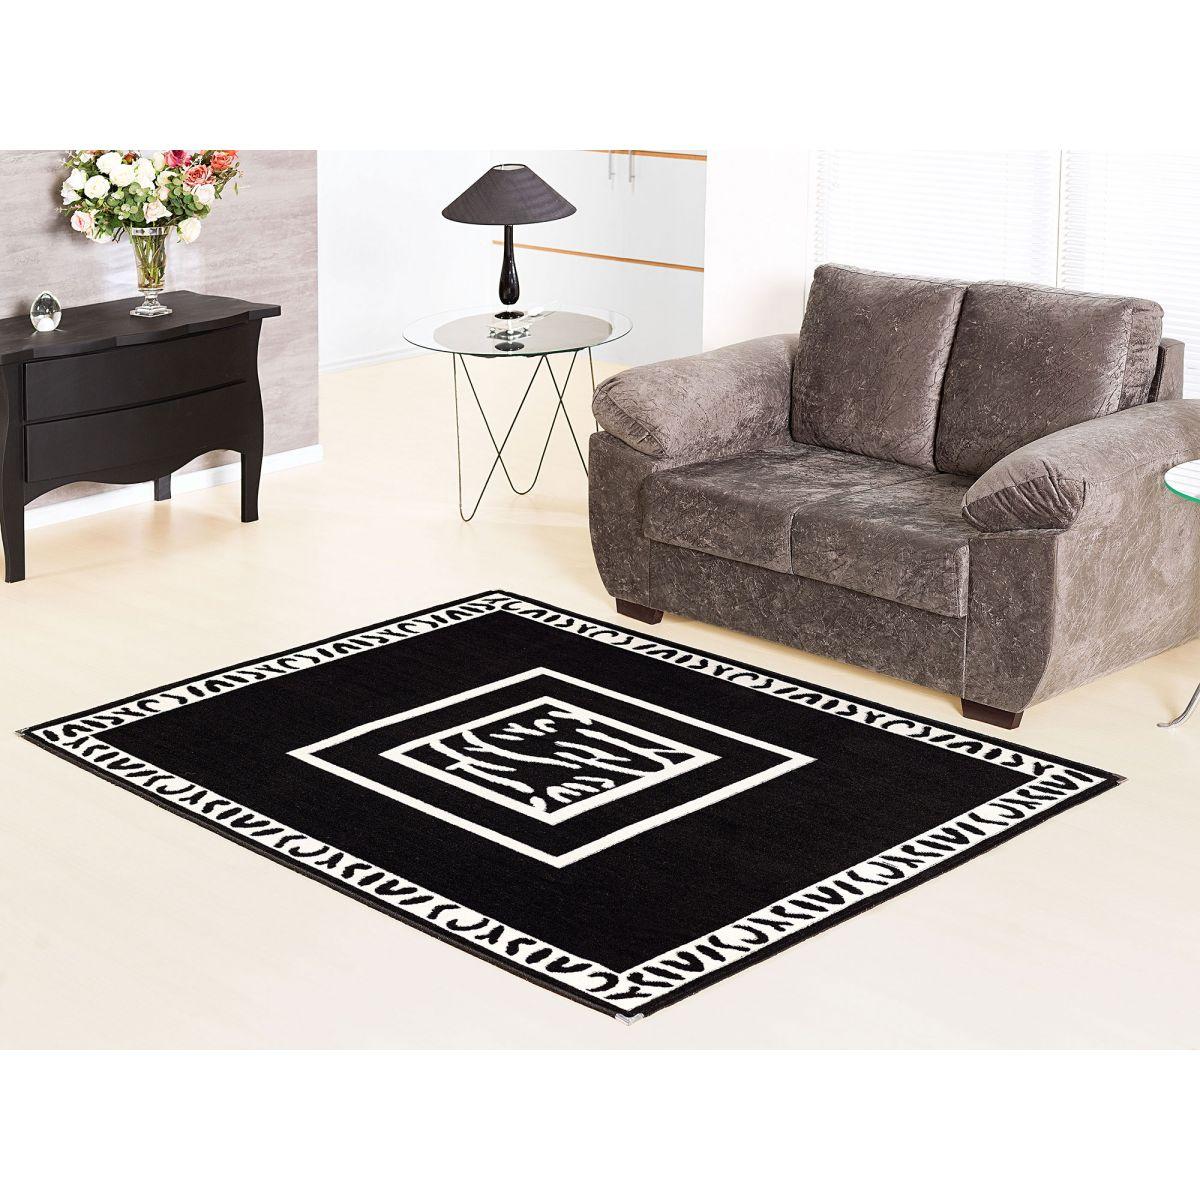 tapete de sala estampado 1 50x1 00 andino lancer a 37 preto. Black Bedroom Furniture Sets. Home Design Ideas